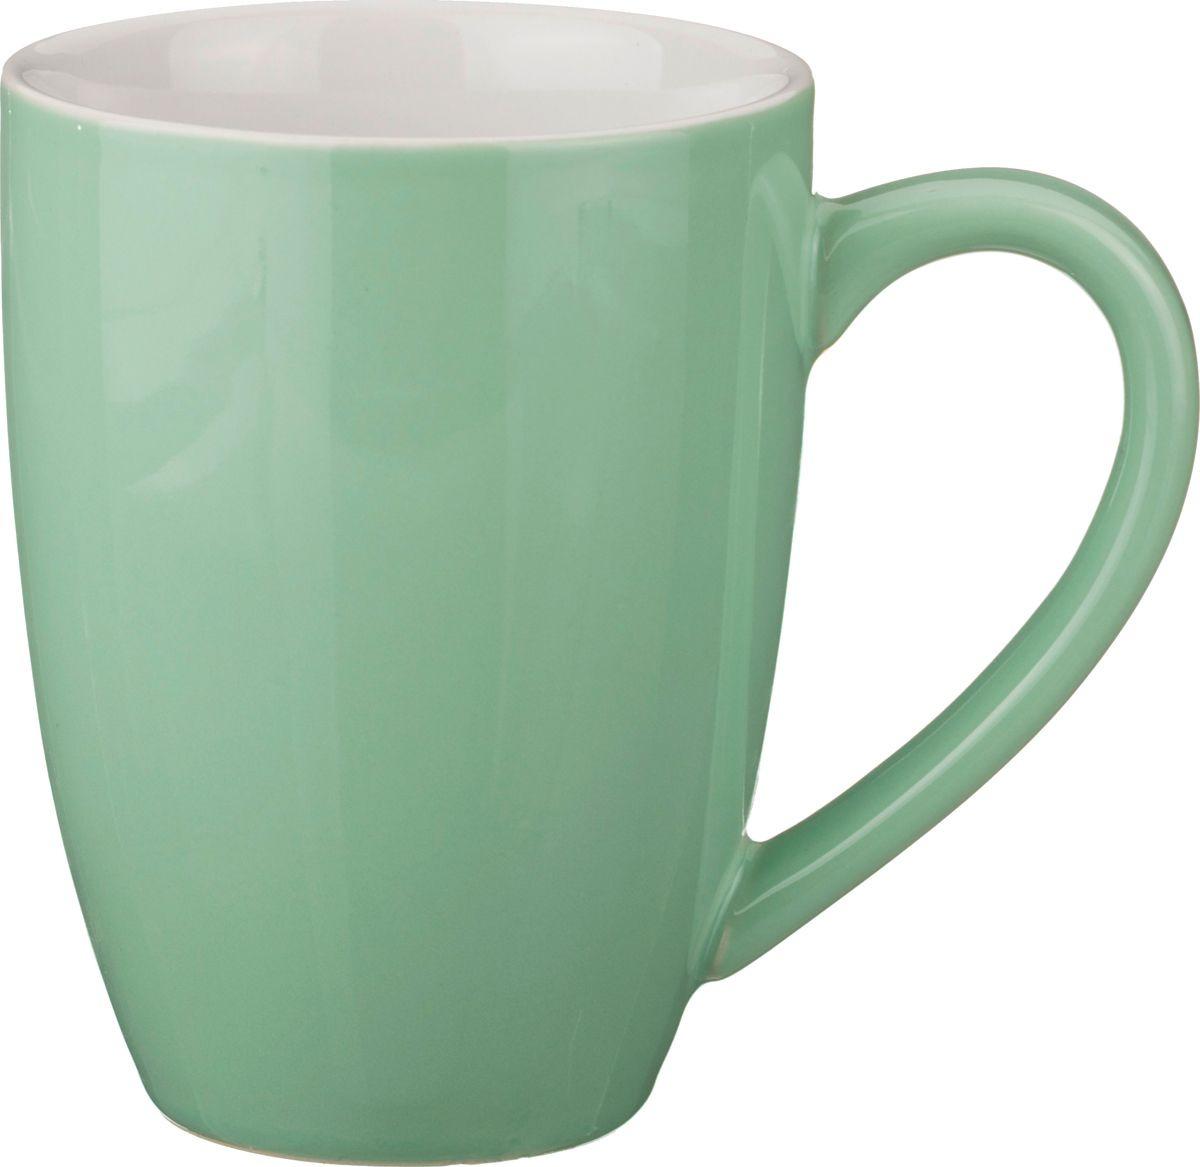 Кружка Agness, 470-350, светло-зеленый, 350 мл все цены